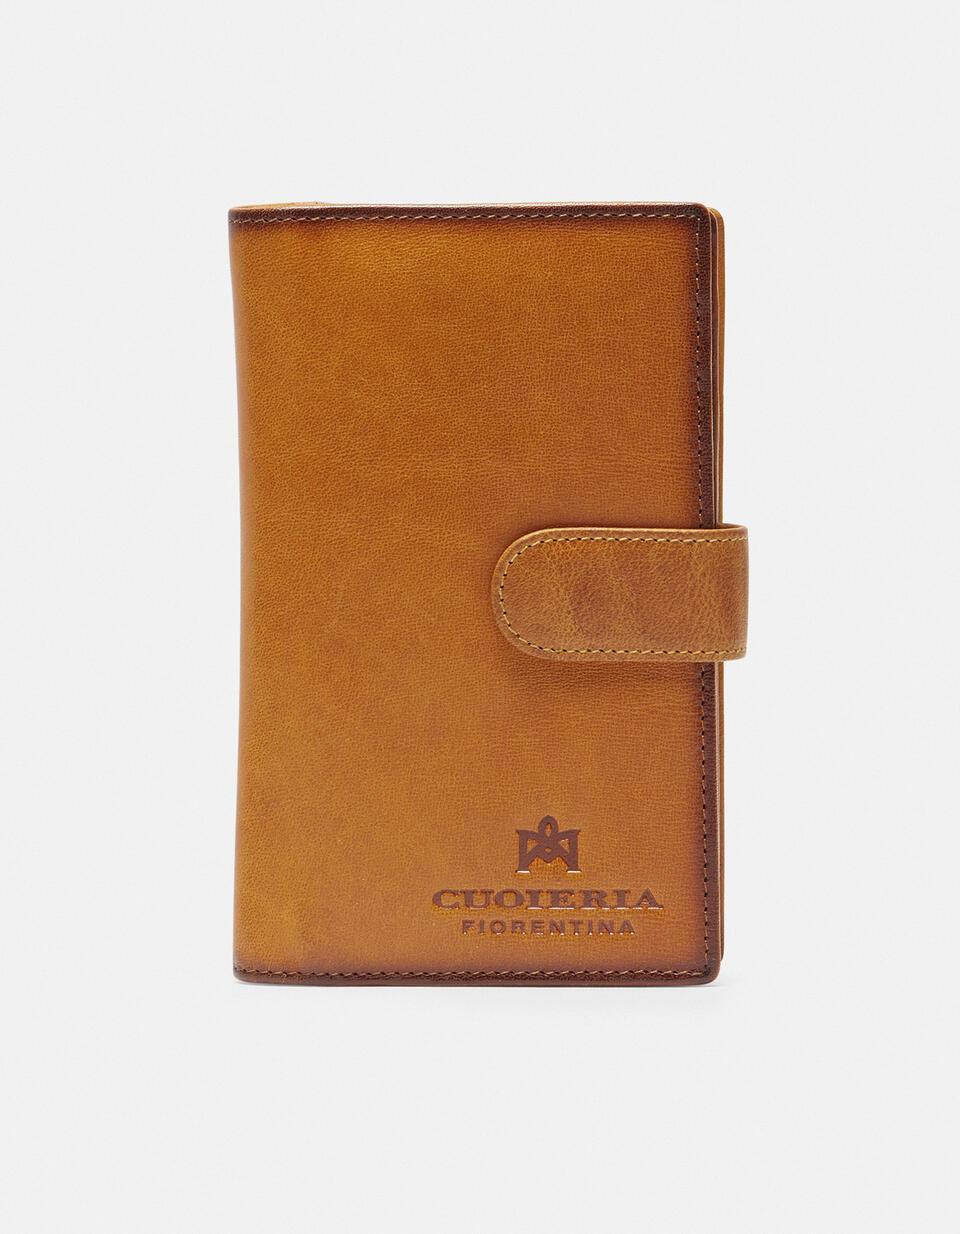 Warm and Color wallet with coin purse GIALLO Cuoieria Fiorentina